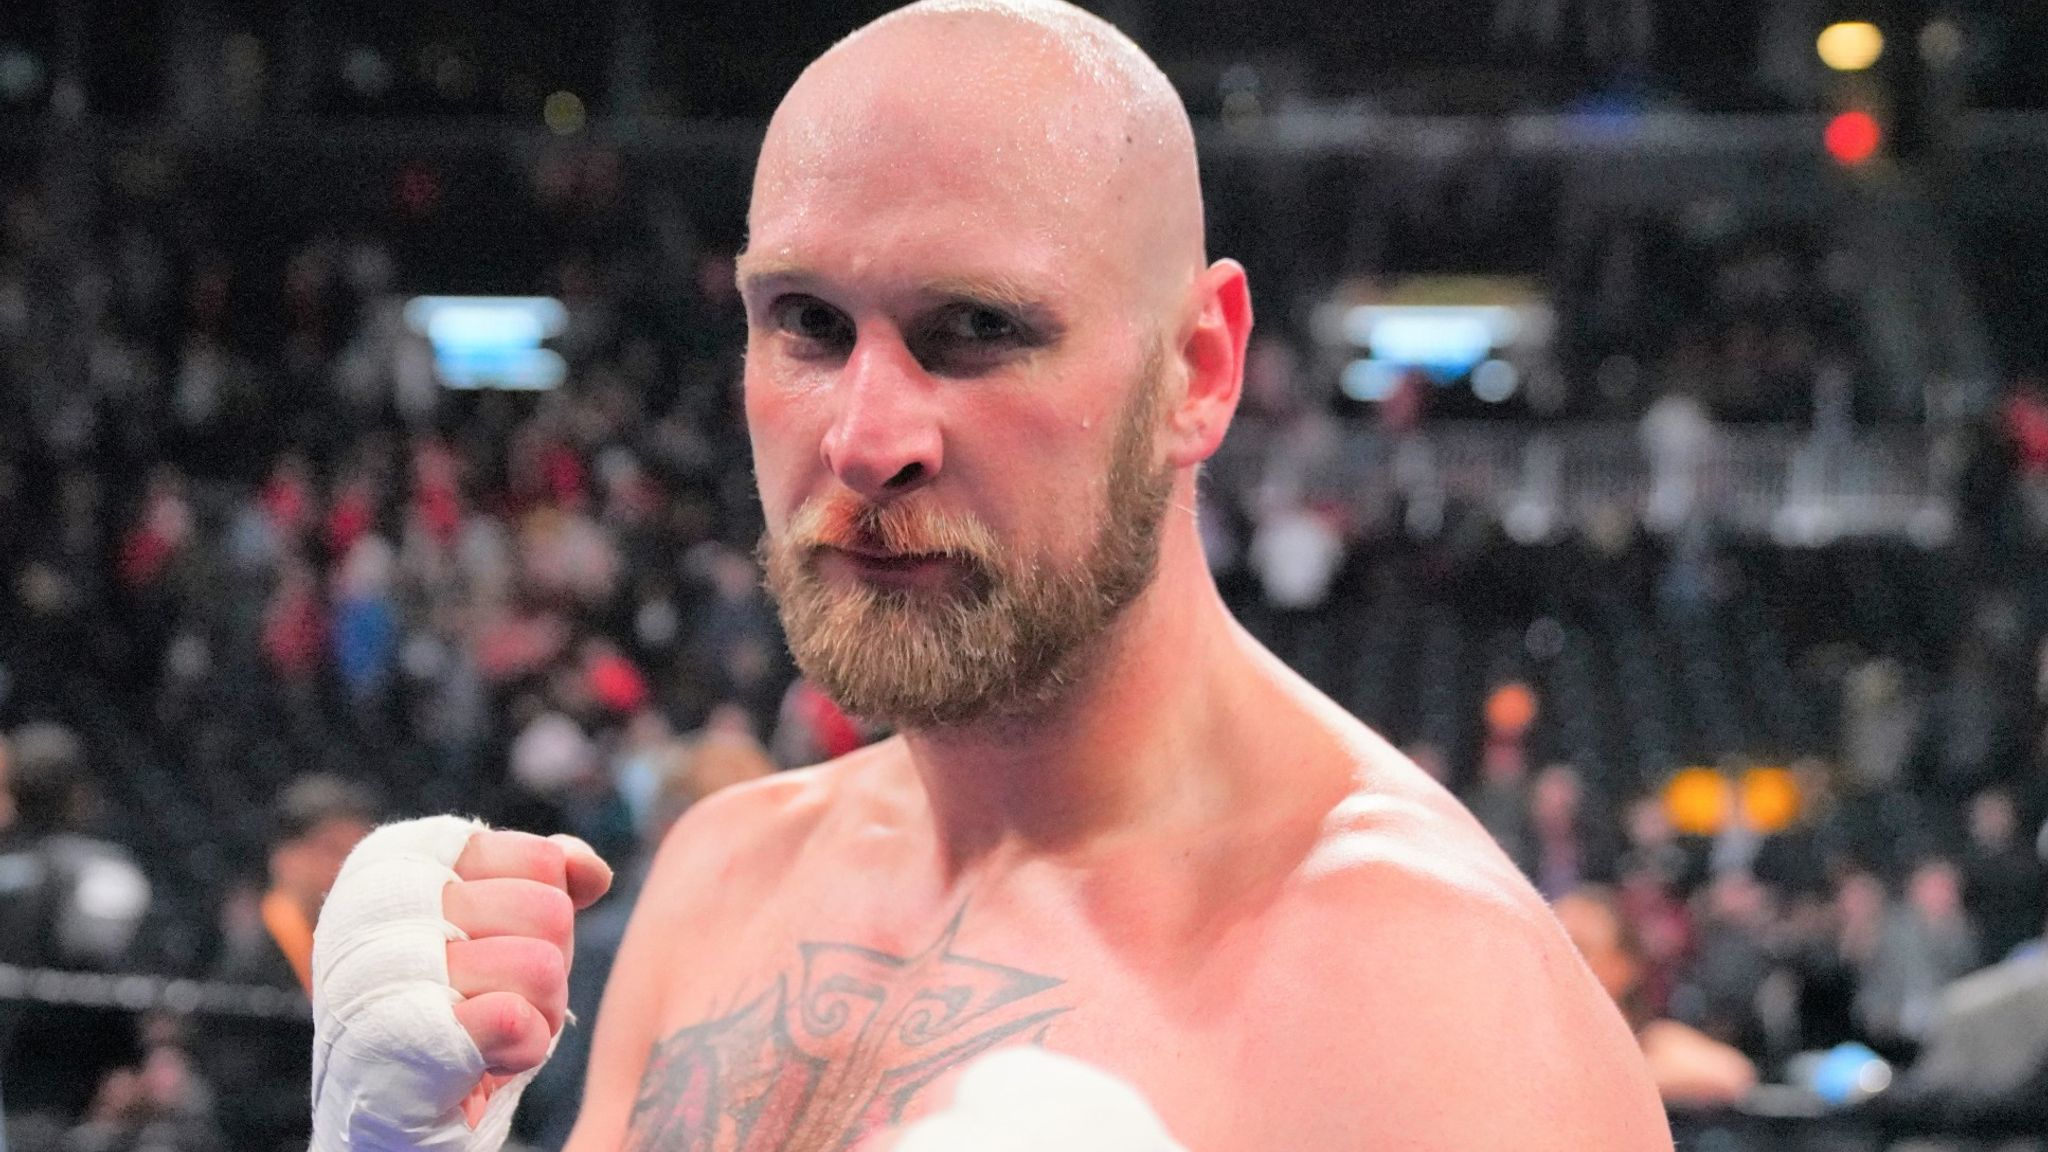 Anthony Joshua: Robert Helenius awaits news on final eliminator for WBA  heavyweight title | Boxing News | Sky Sports